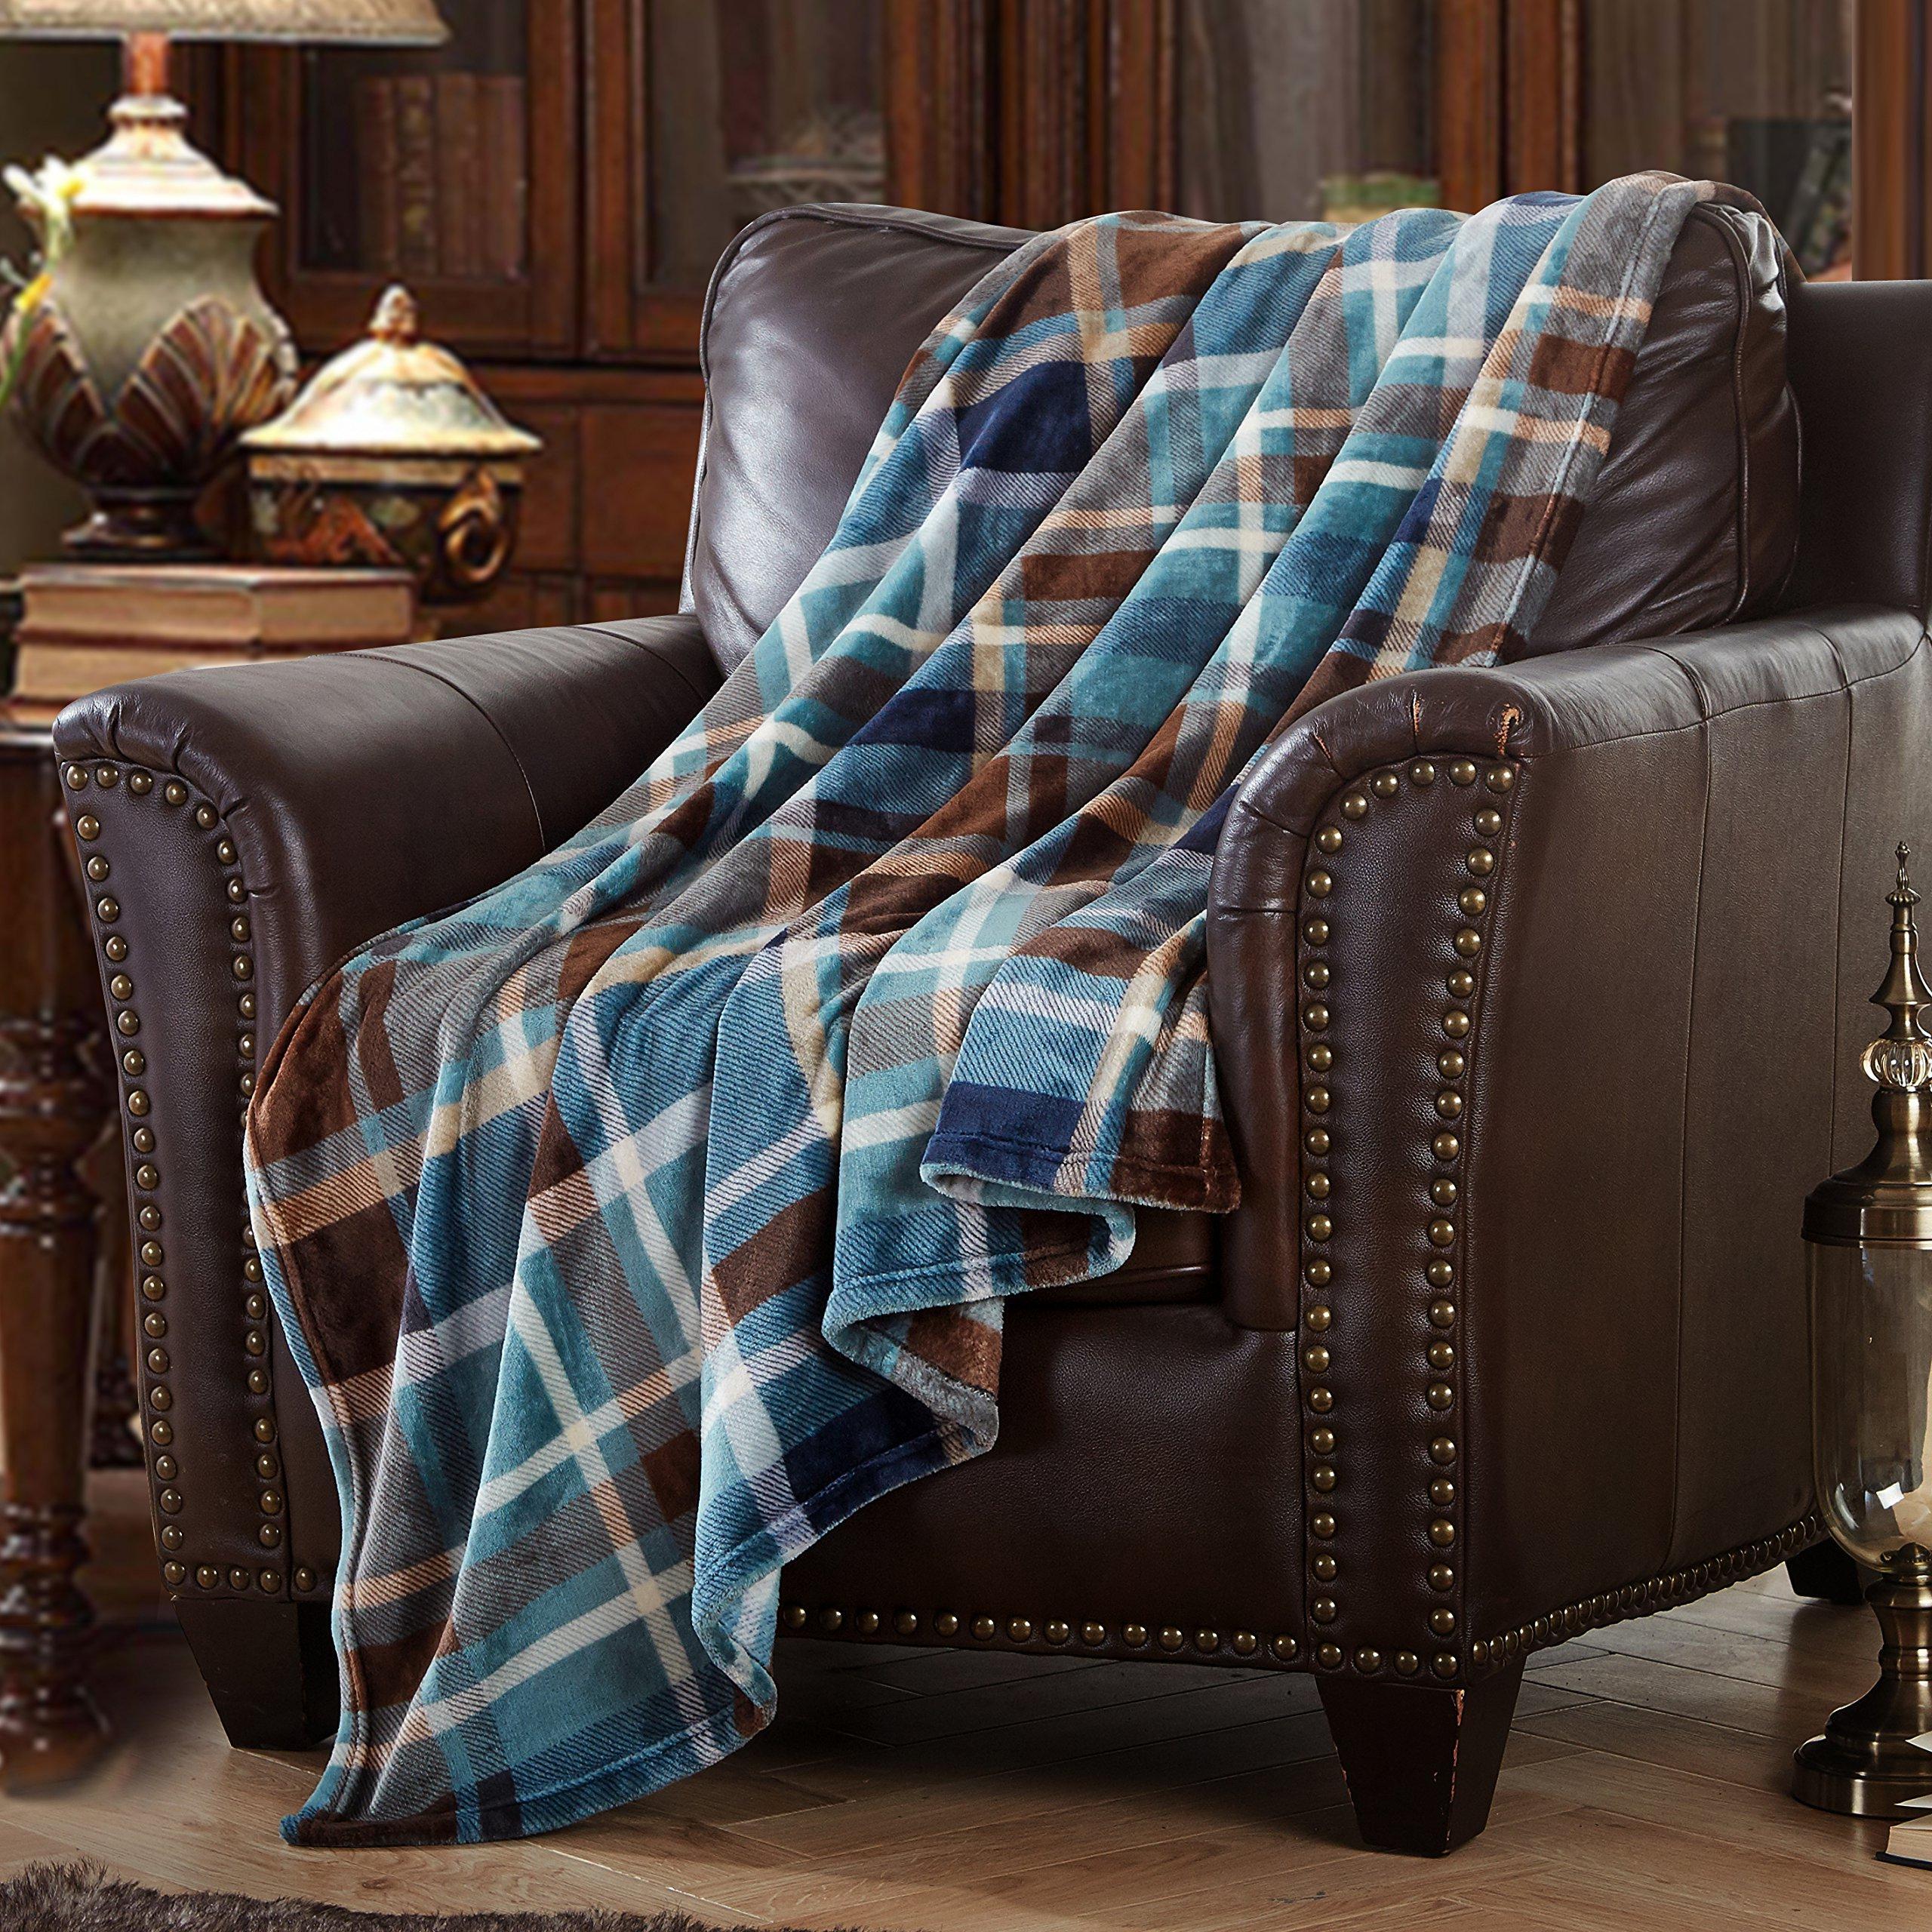 MERRYLIFE Throw Blanket Plaid Sherpa | Ultra-Plush Soft Colo